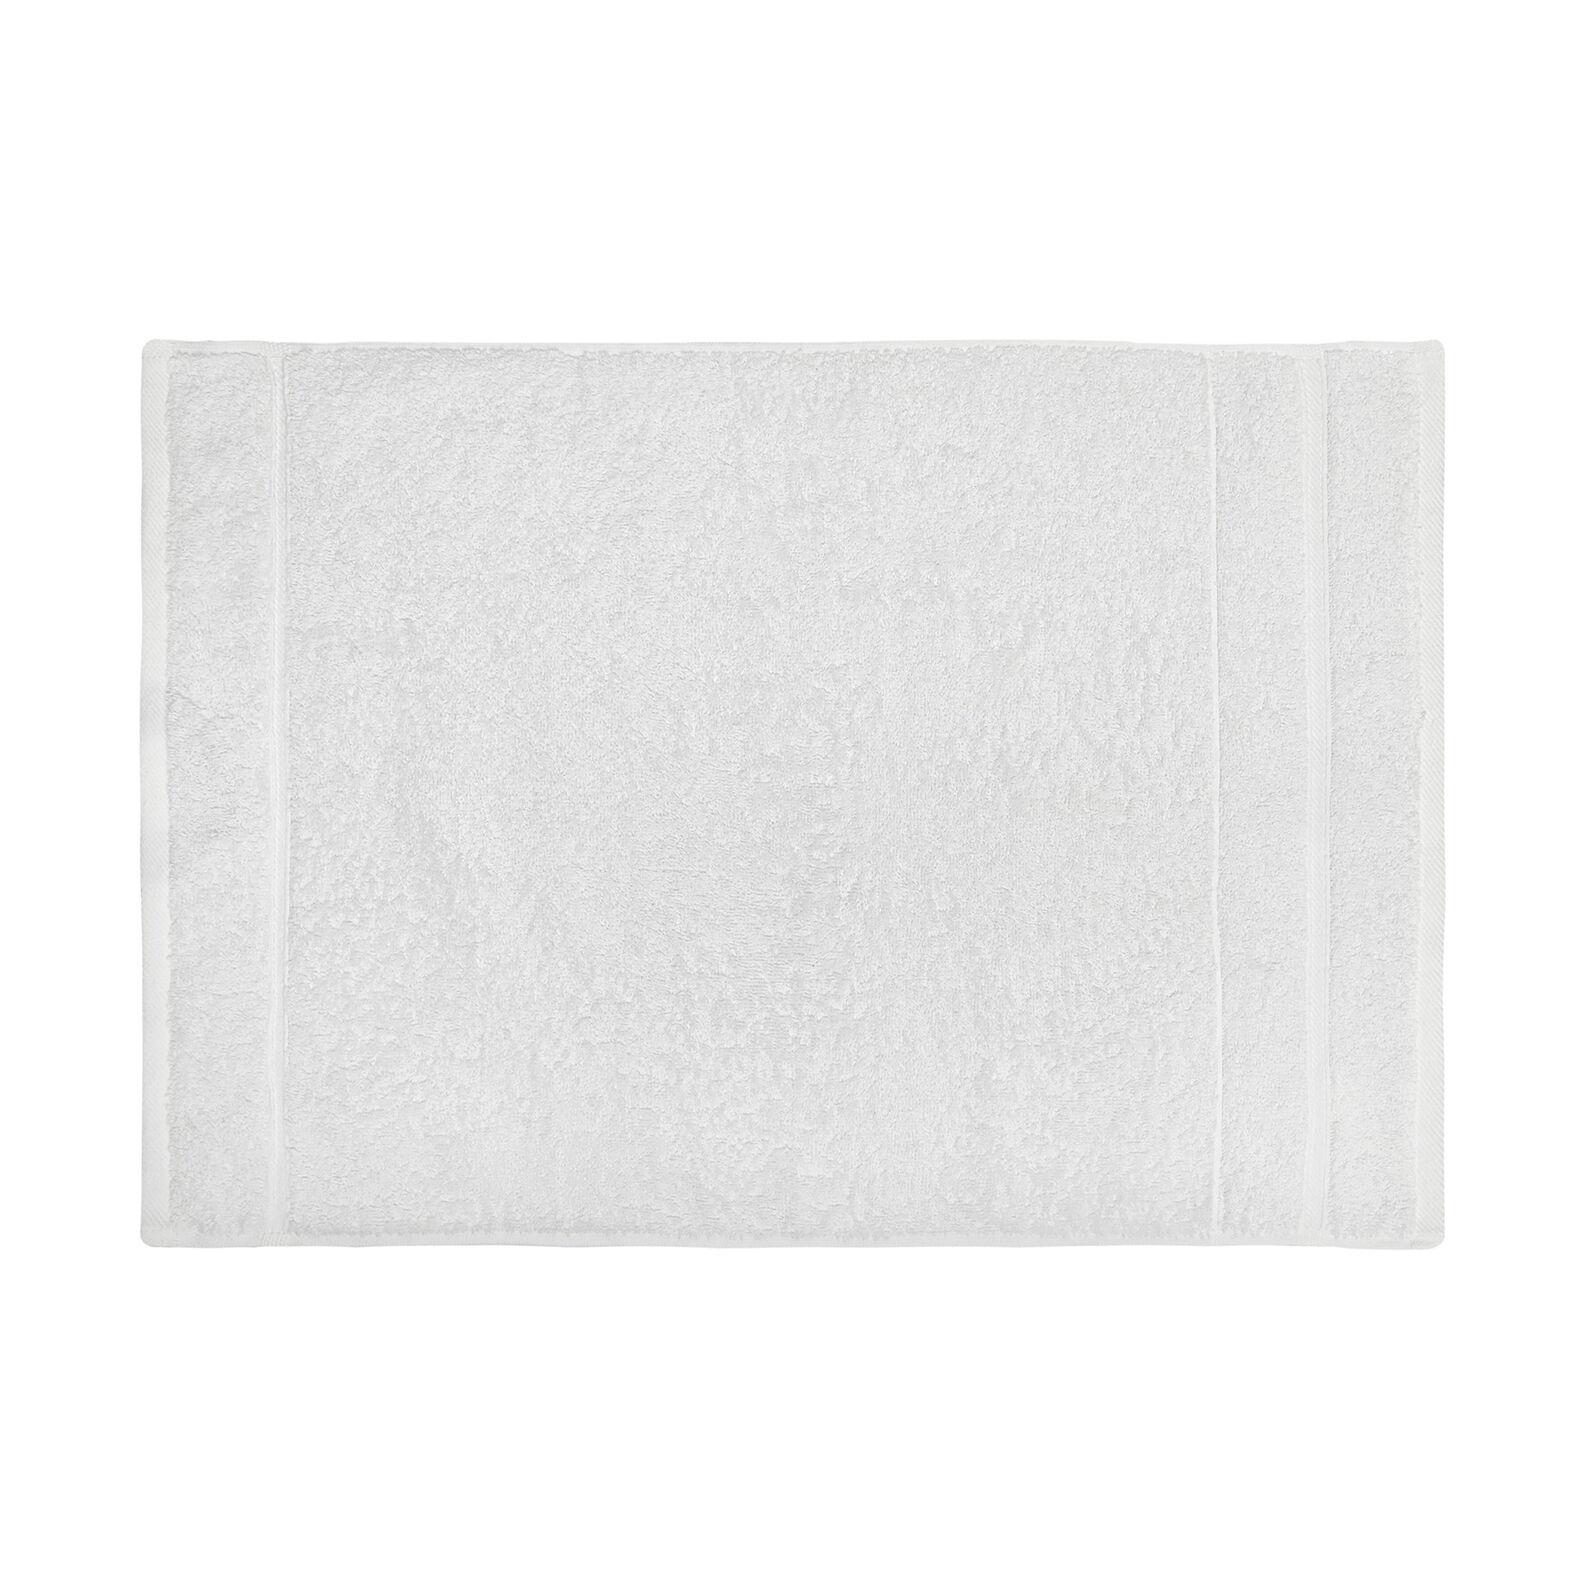 Solid colour cotton terry towel